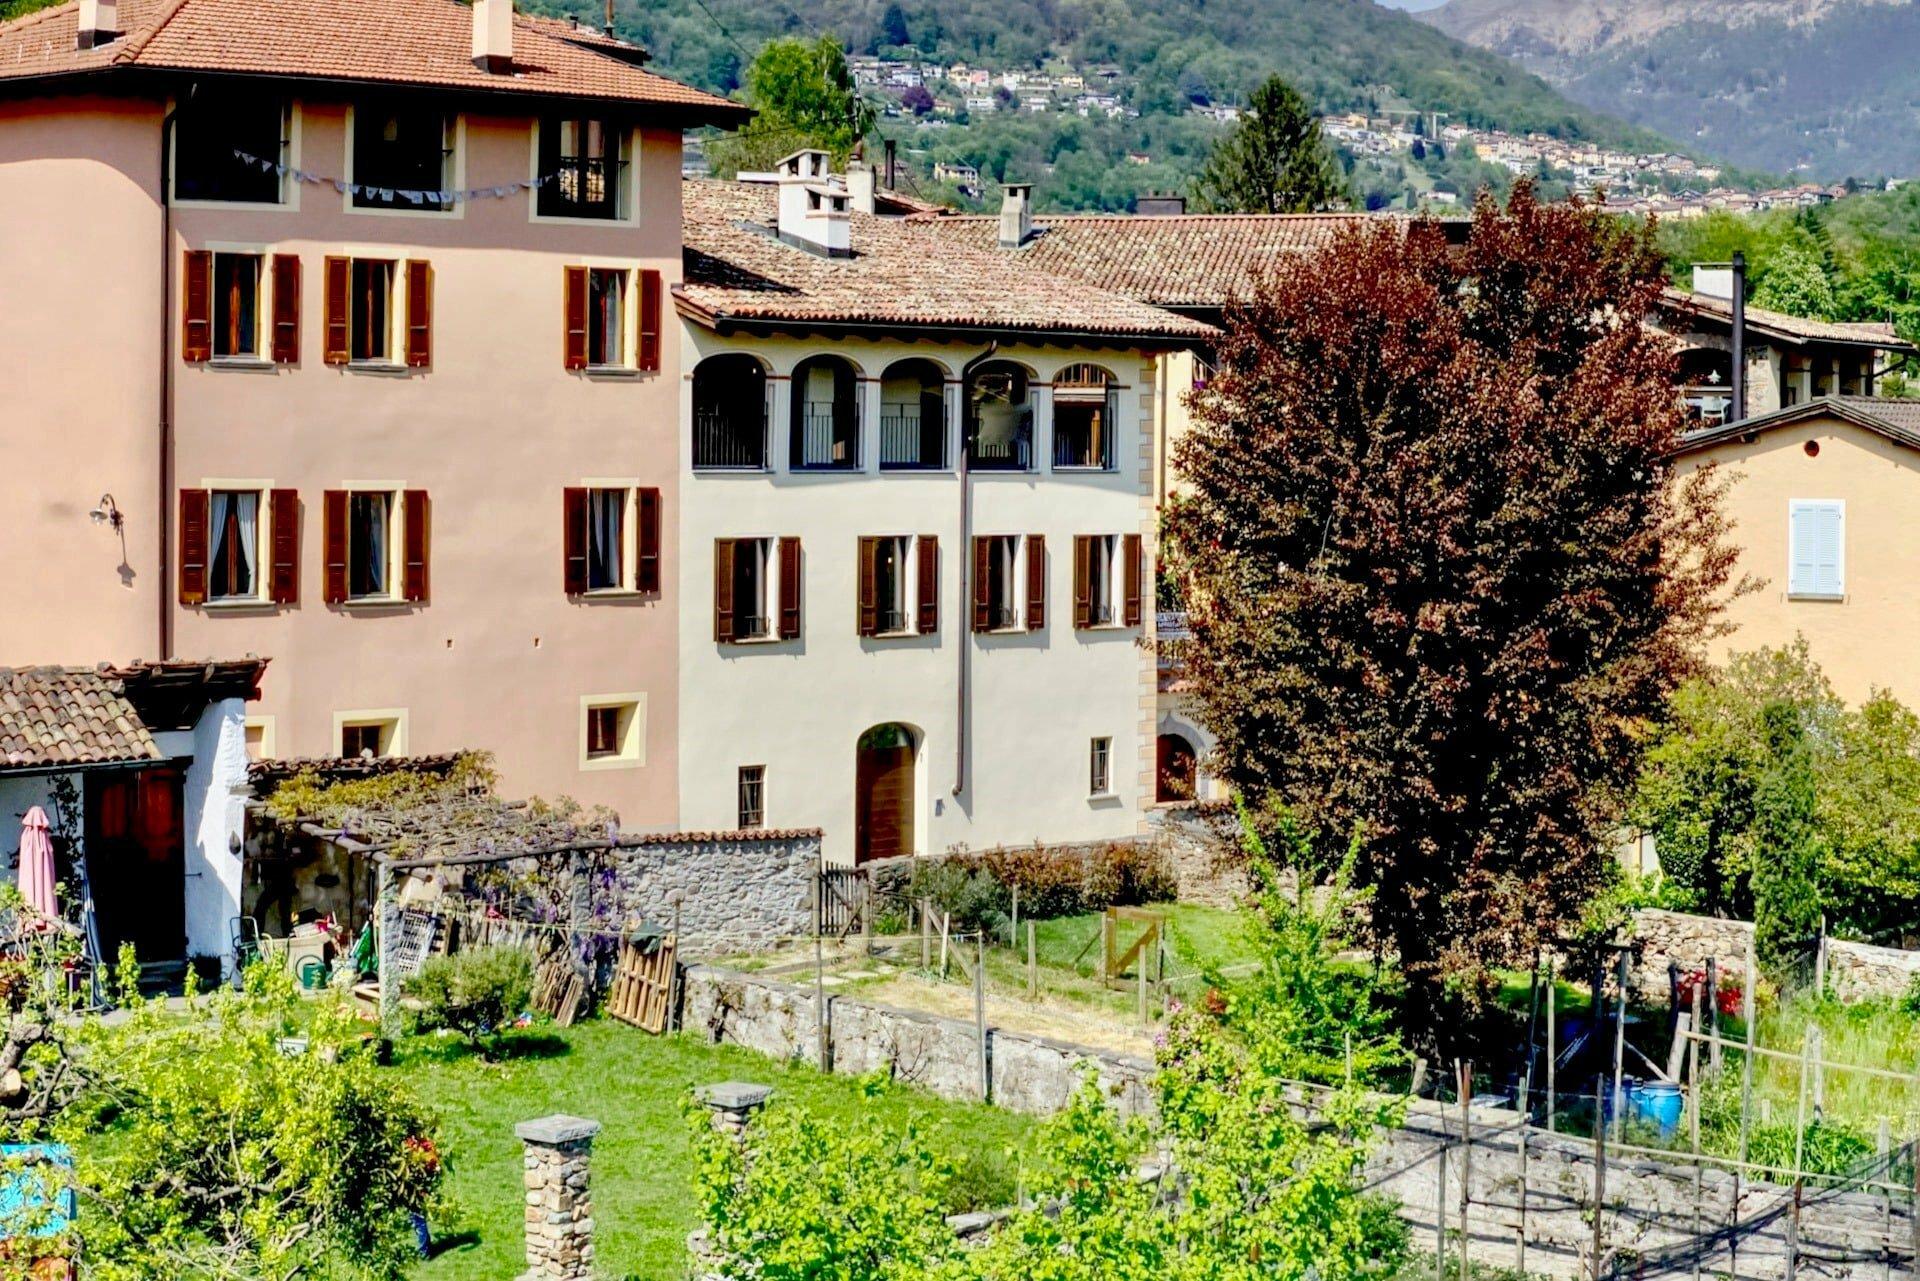 House in Origlio, Ticino, Switzerland 1